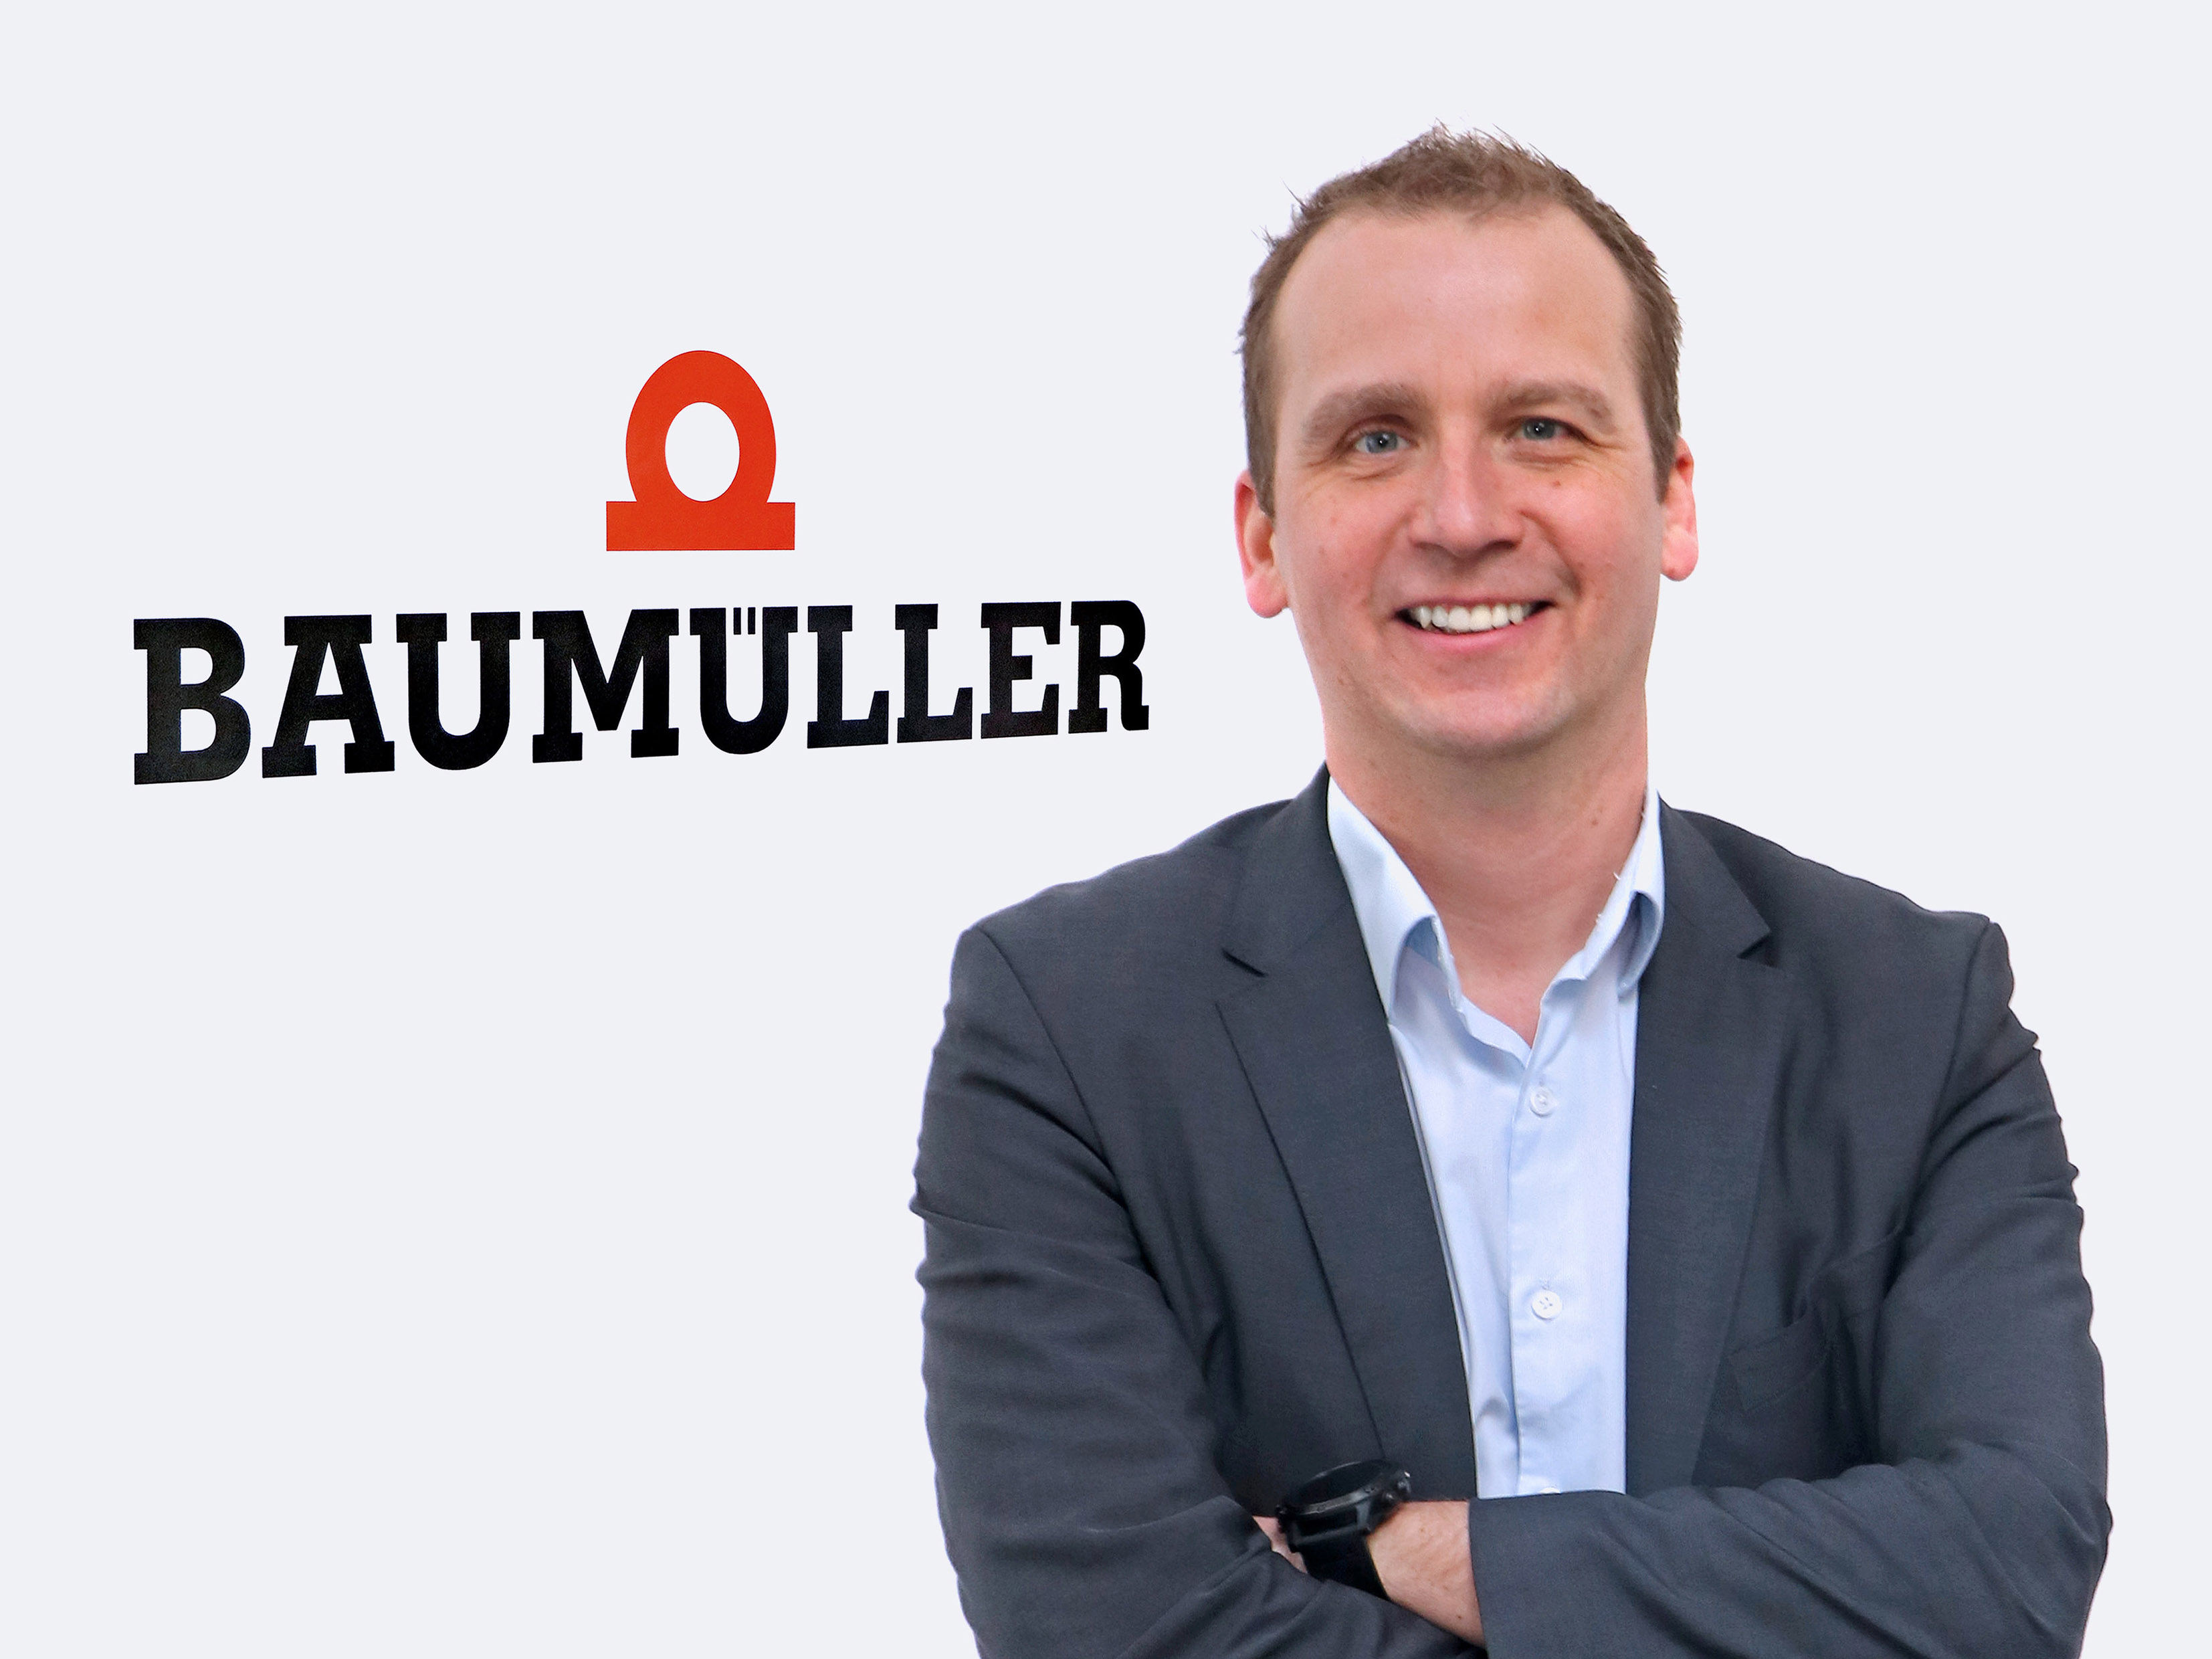 Baumüller Niederlassung